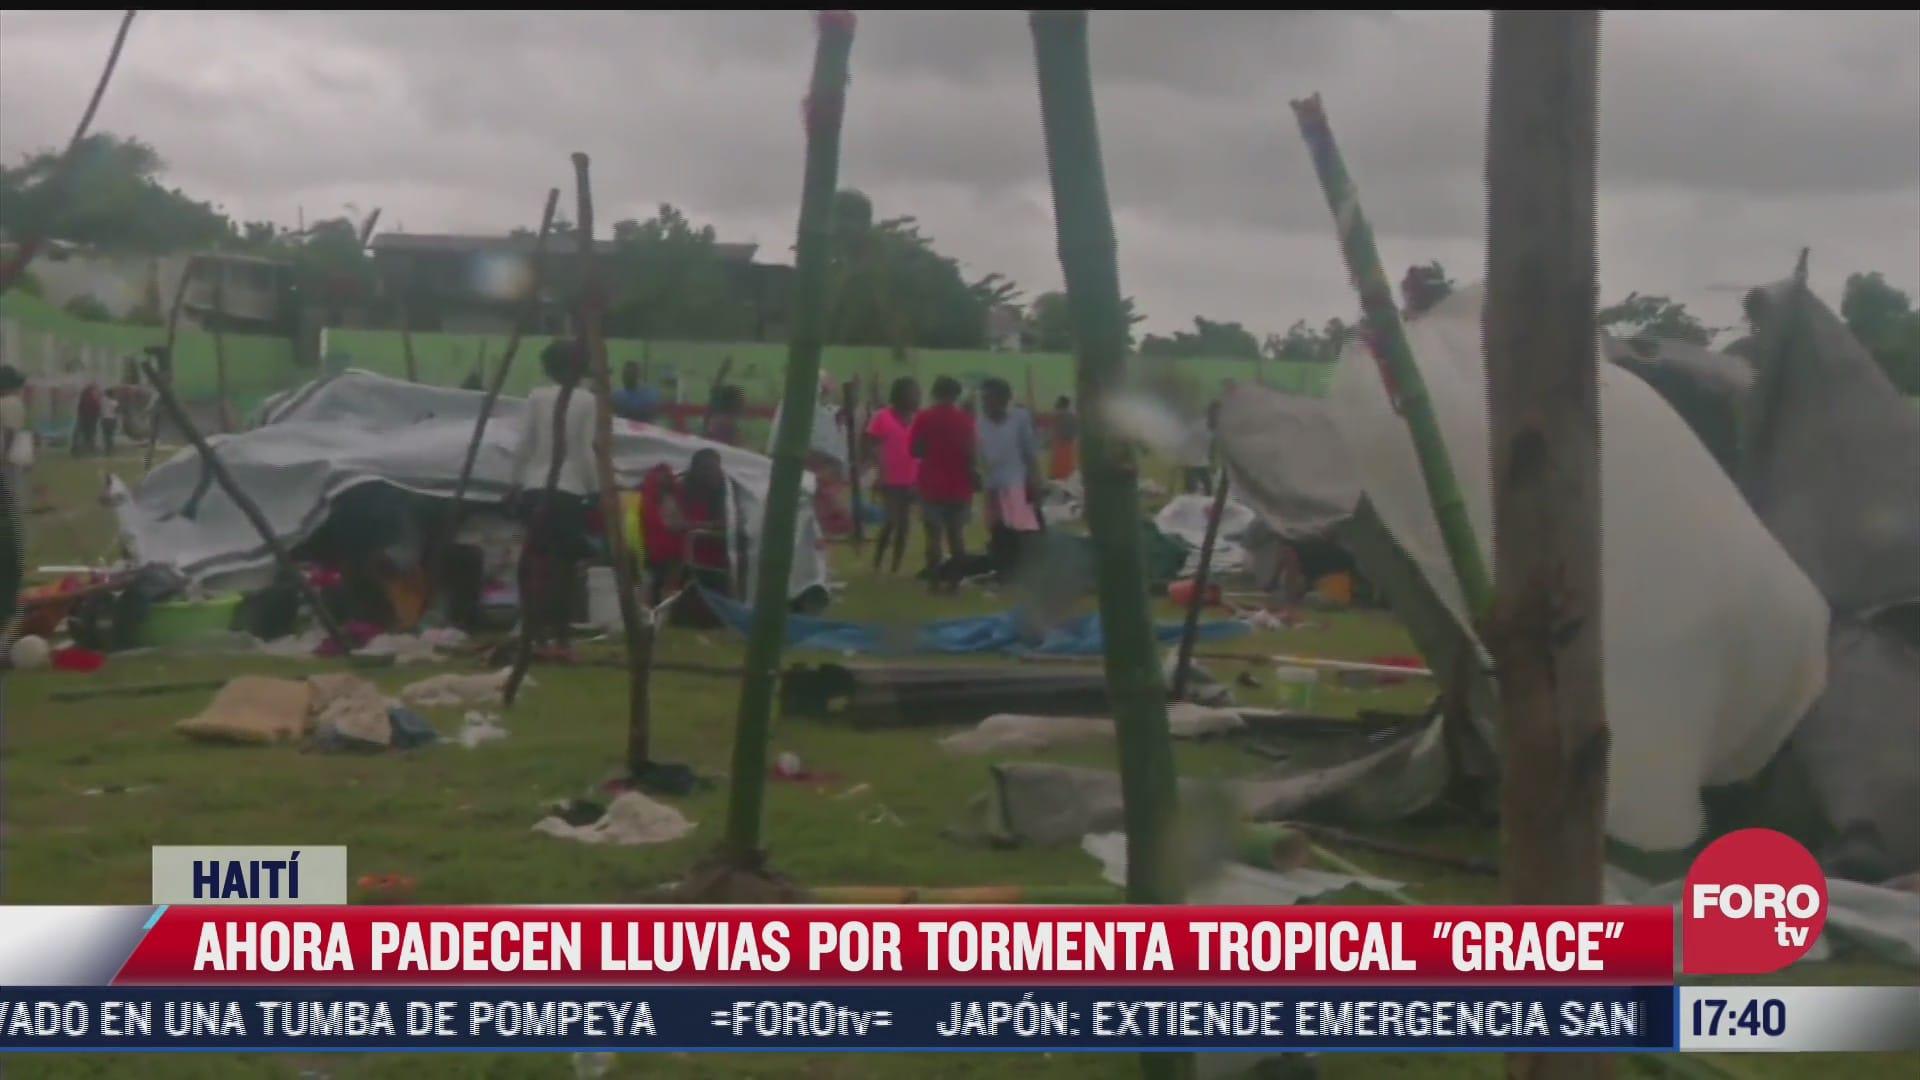 ahora padecen lluvias por tormenta tropical grace en haiti